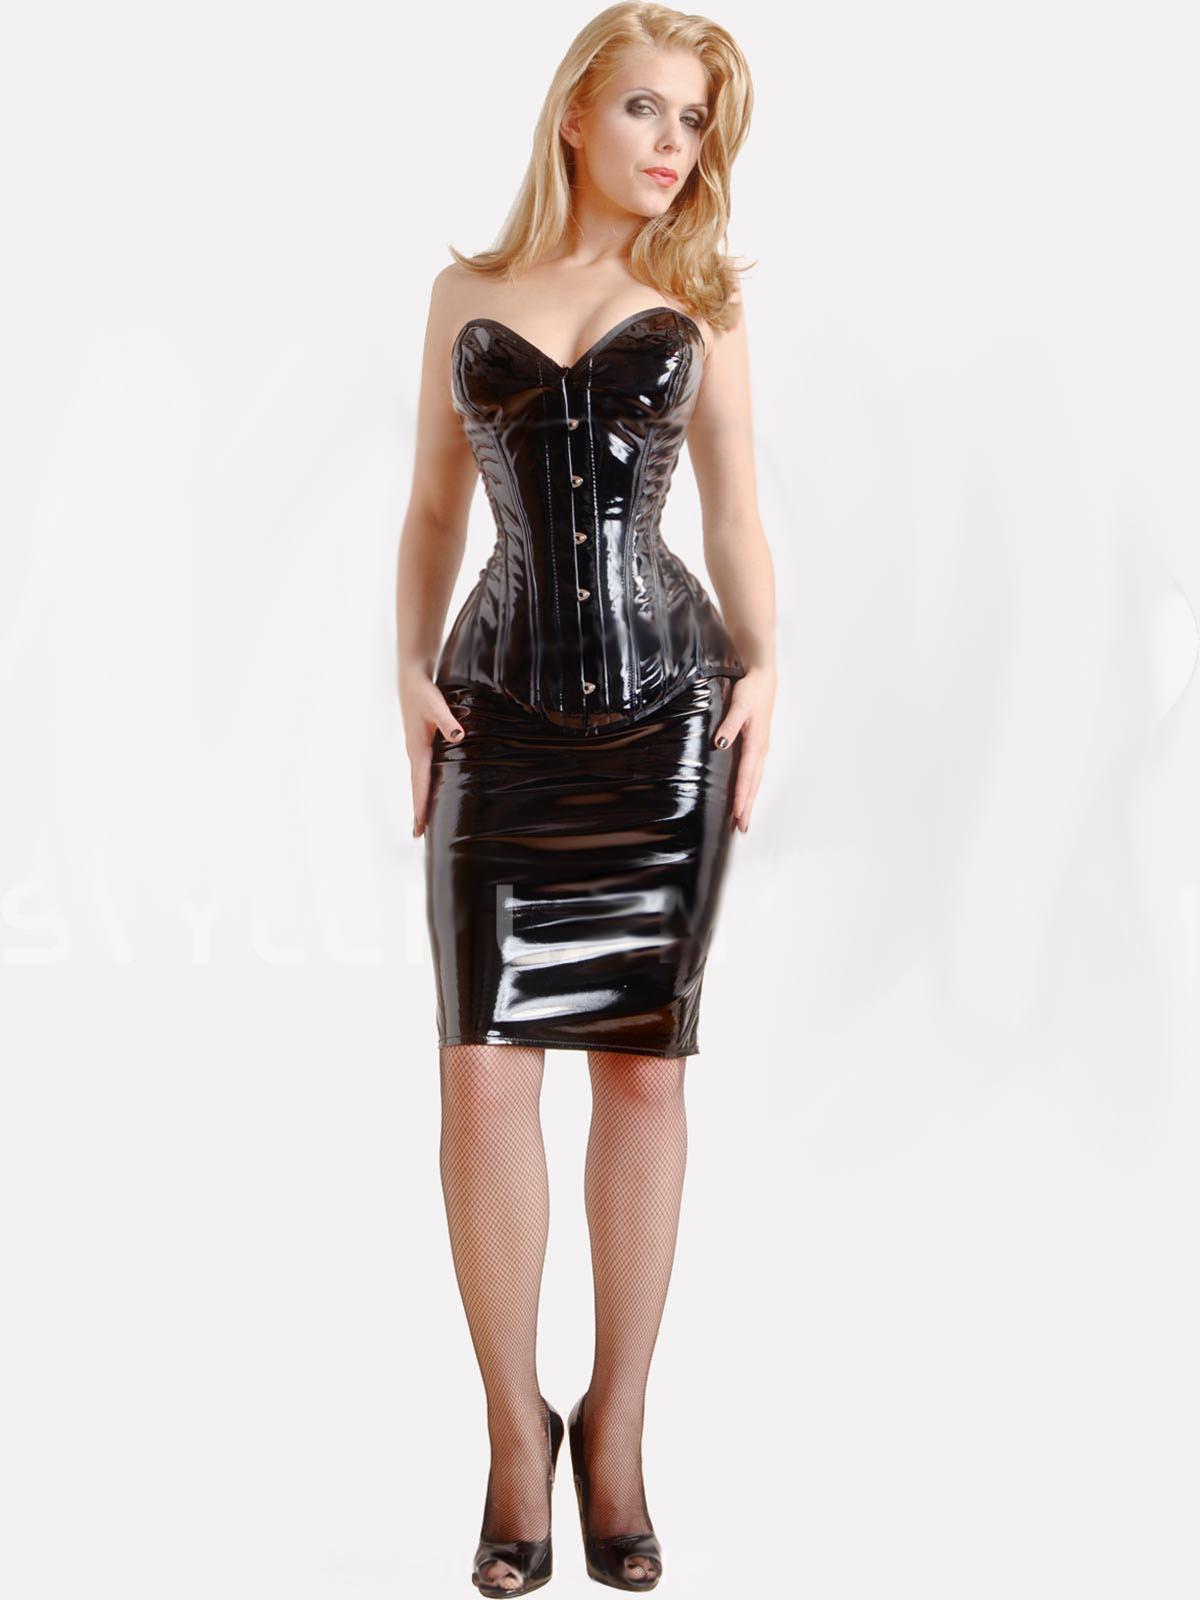 sexy+tight+corset+(37).jpg